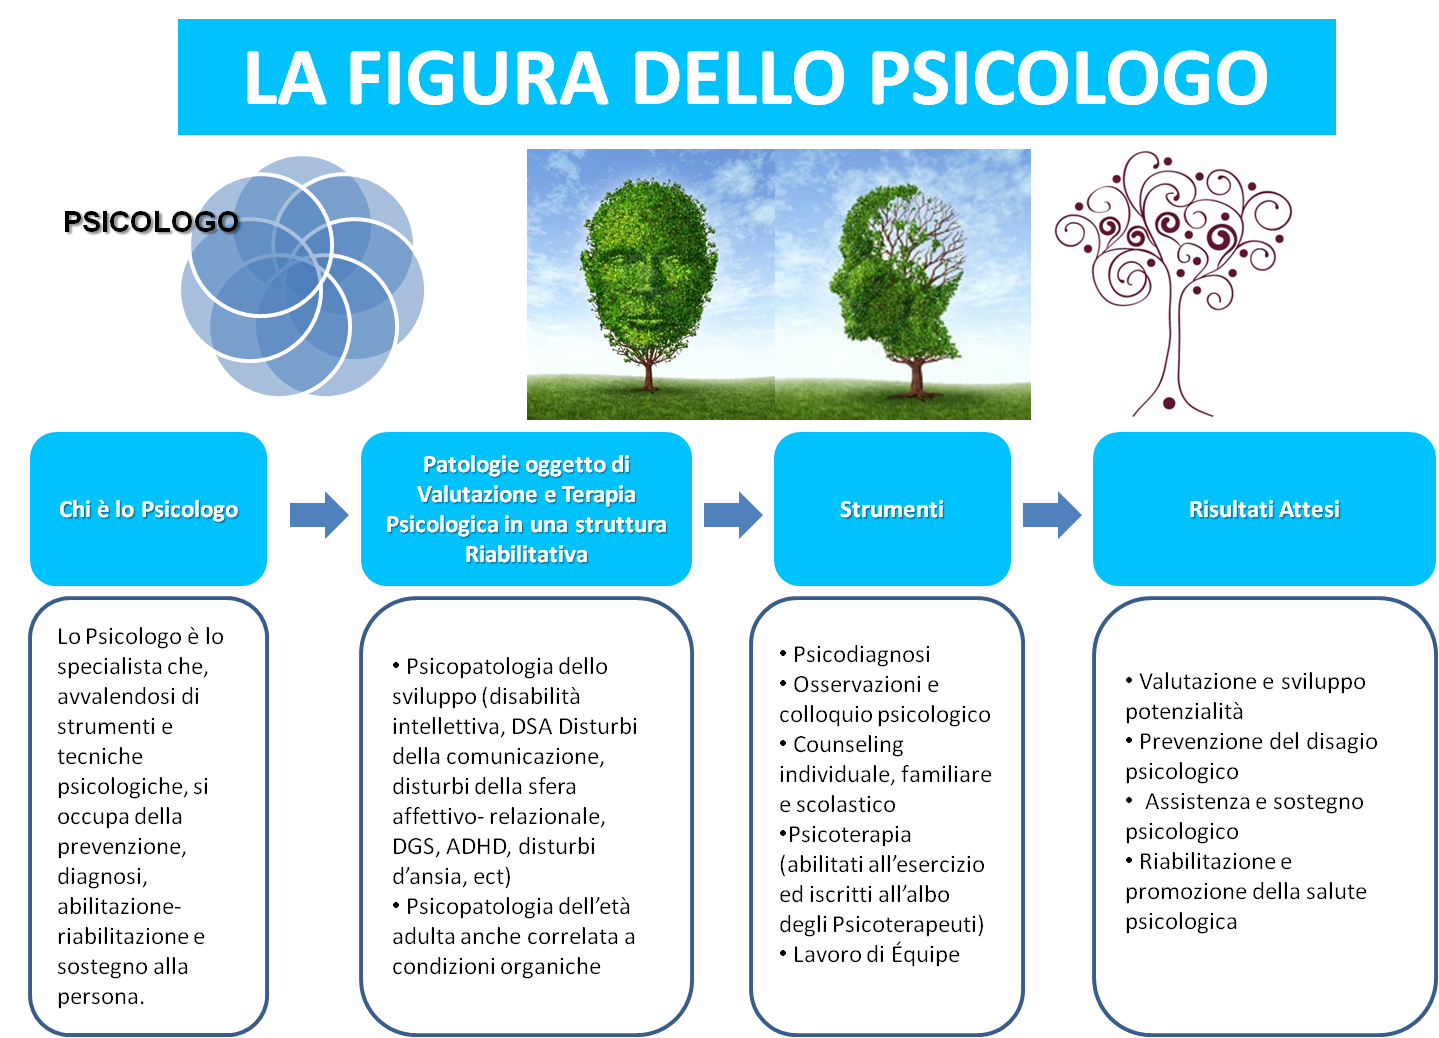 Lo Psicologo